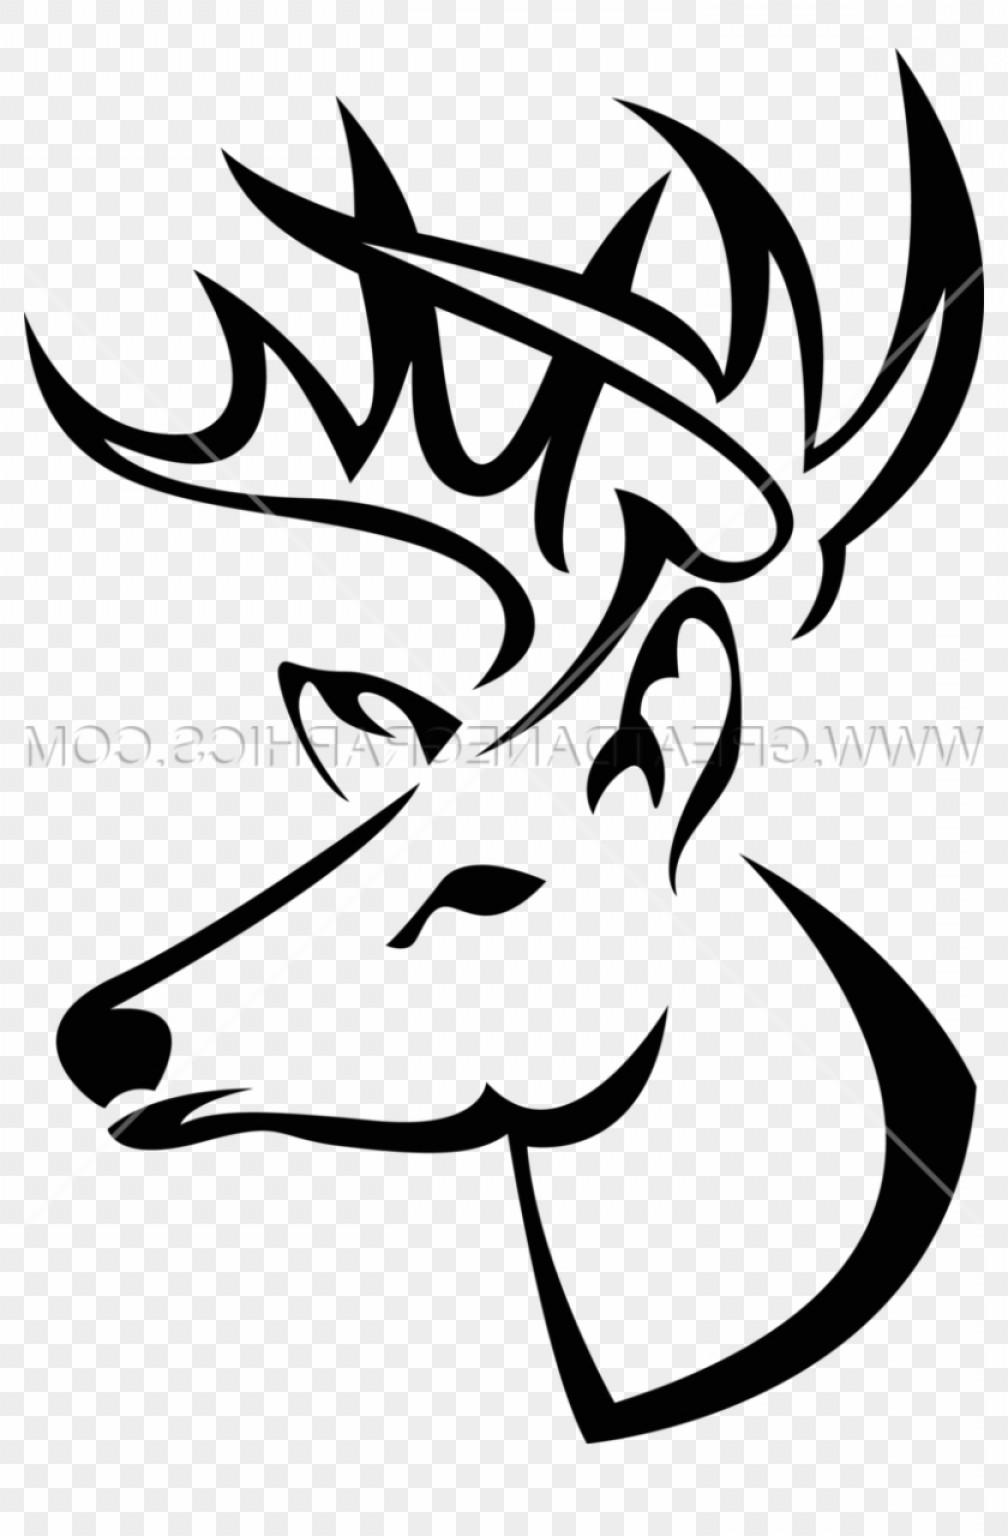 1008x1536 Miadbmbadeer Skull Art Download Buck Head Line Drawing Soidergi